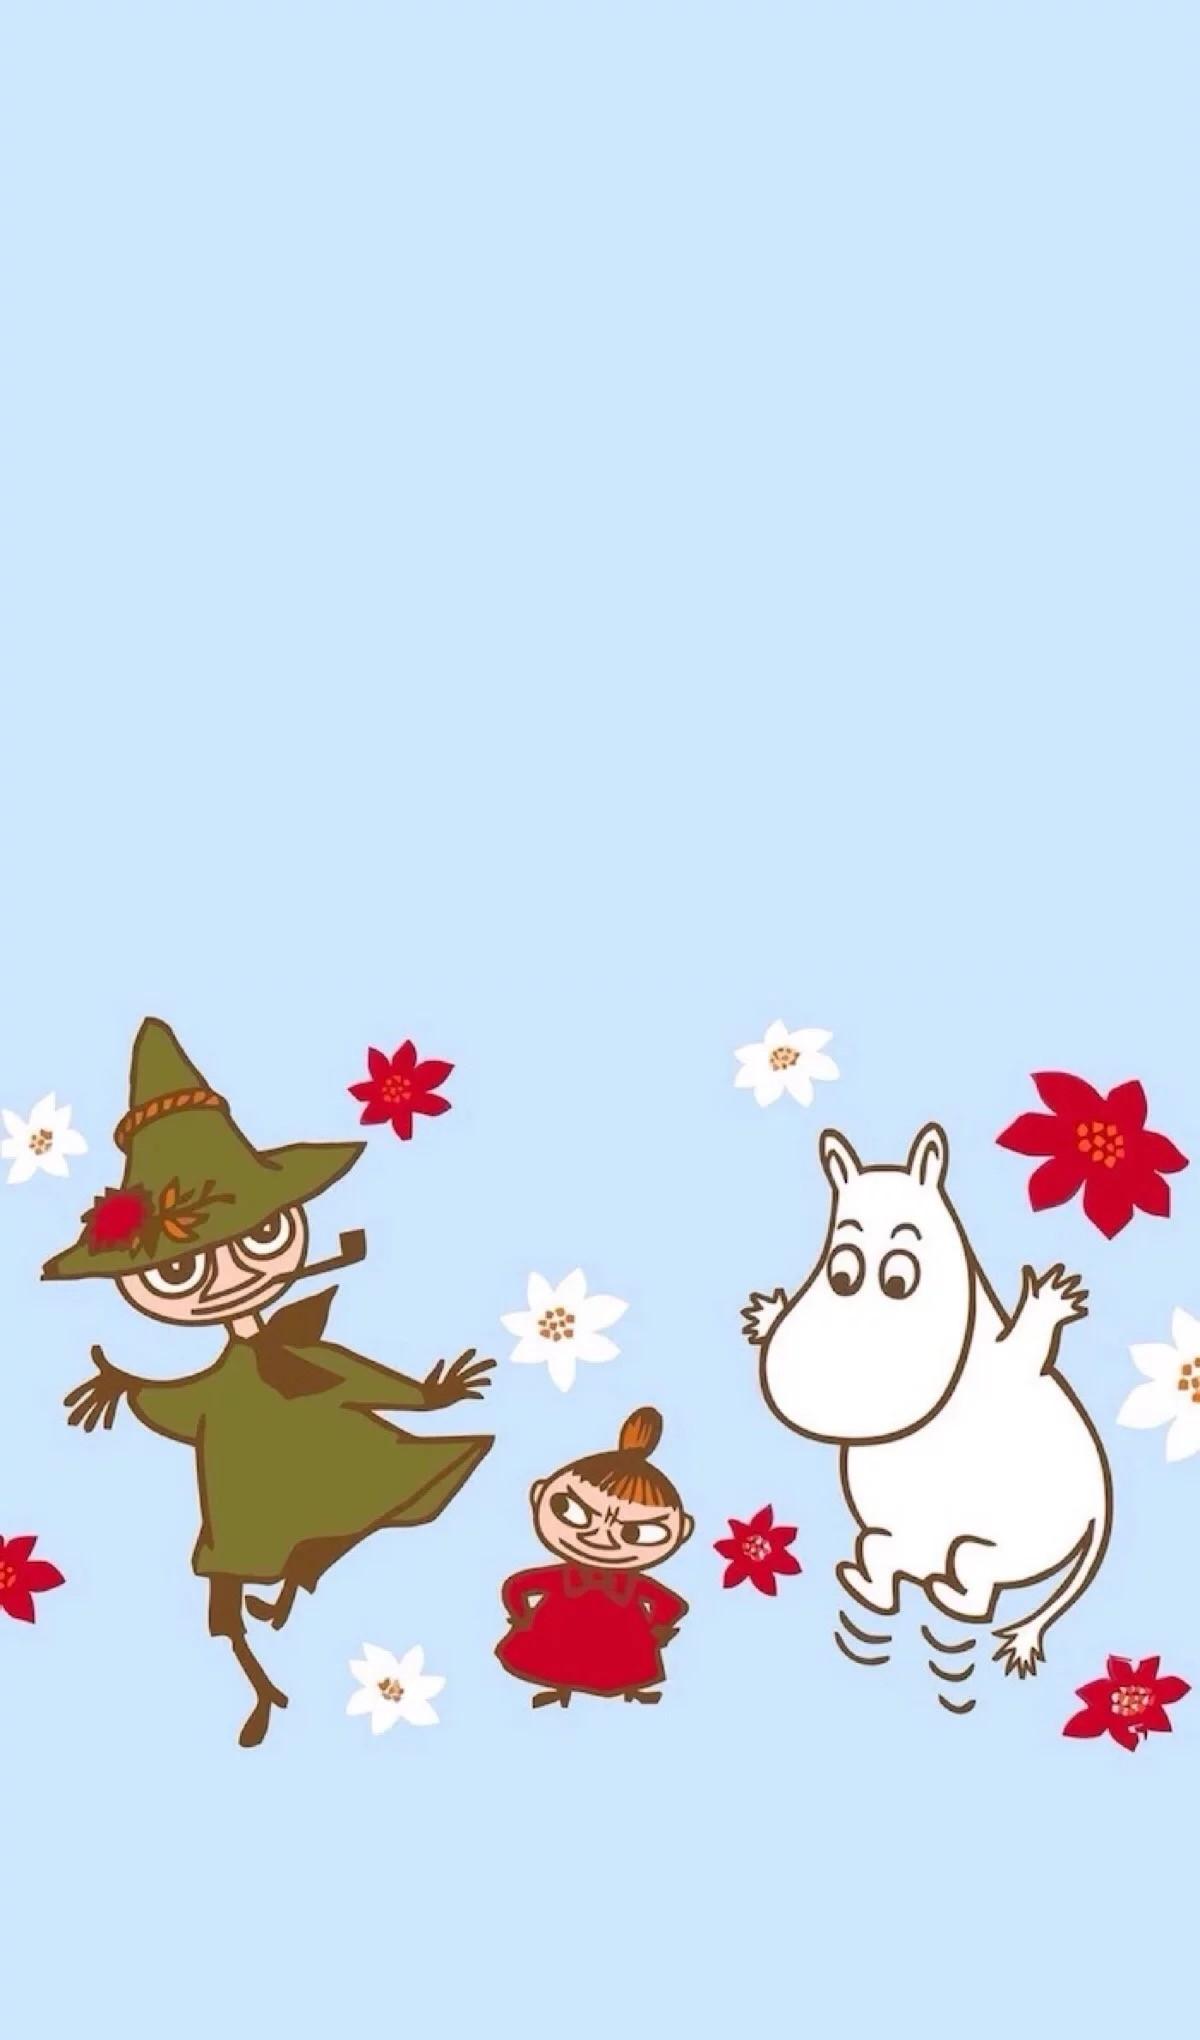 Moomin Valley, Kawaii Wallpaper, Wallpaper Backgrounds, Iphone Wallpaper,  Cartoon Characters, Book Illustrations, Tove Jansson